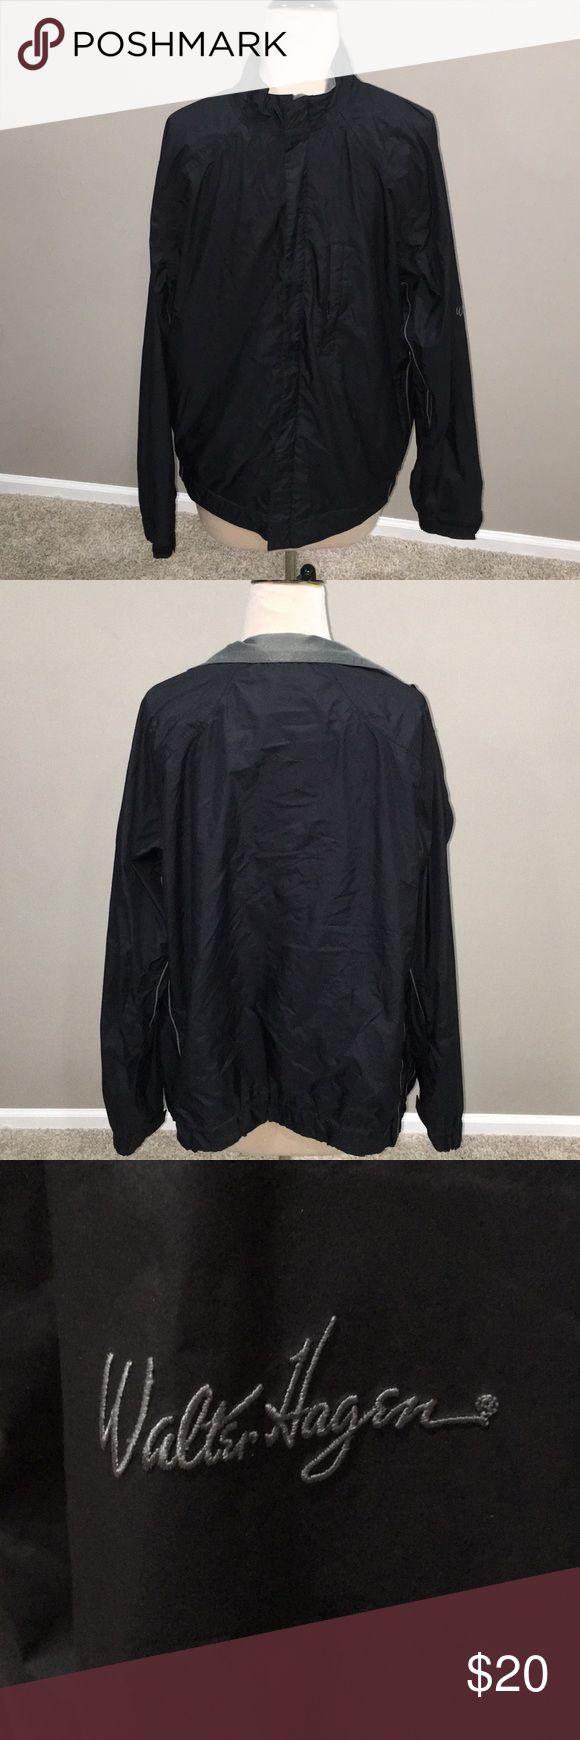 MENS WALTER HAGEN GOLF JACKET EXCELLENT USED CONDITION Walter Hagen Jackets & Coats